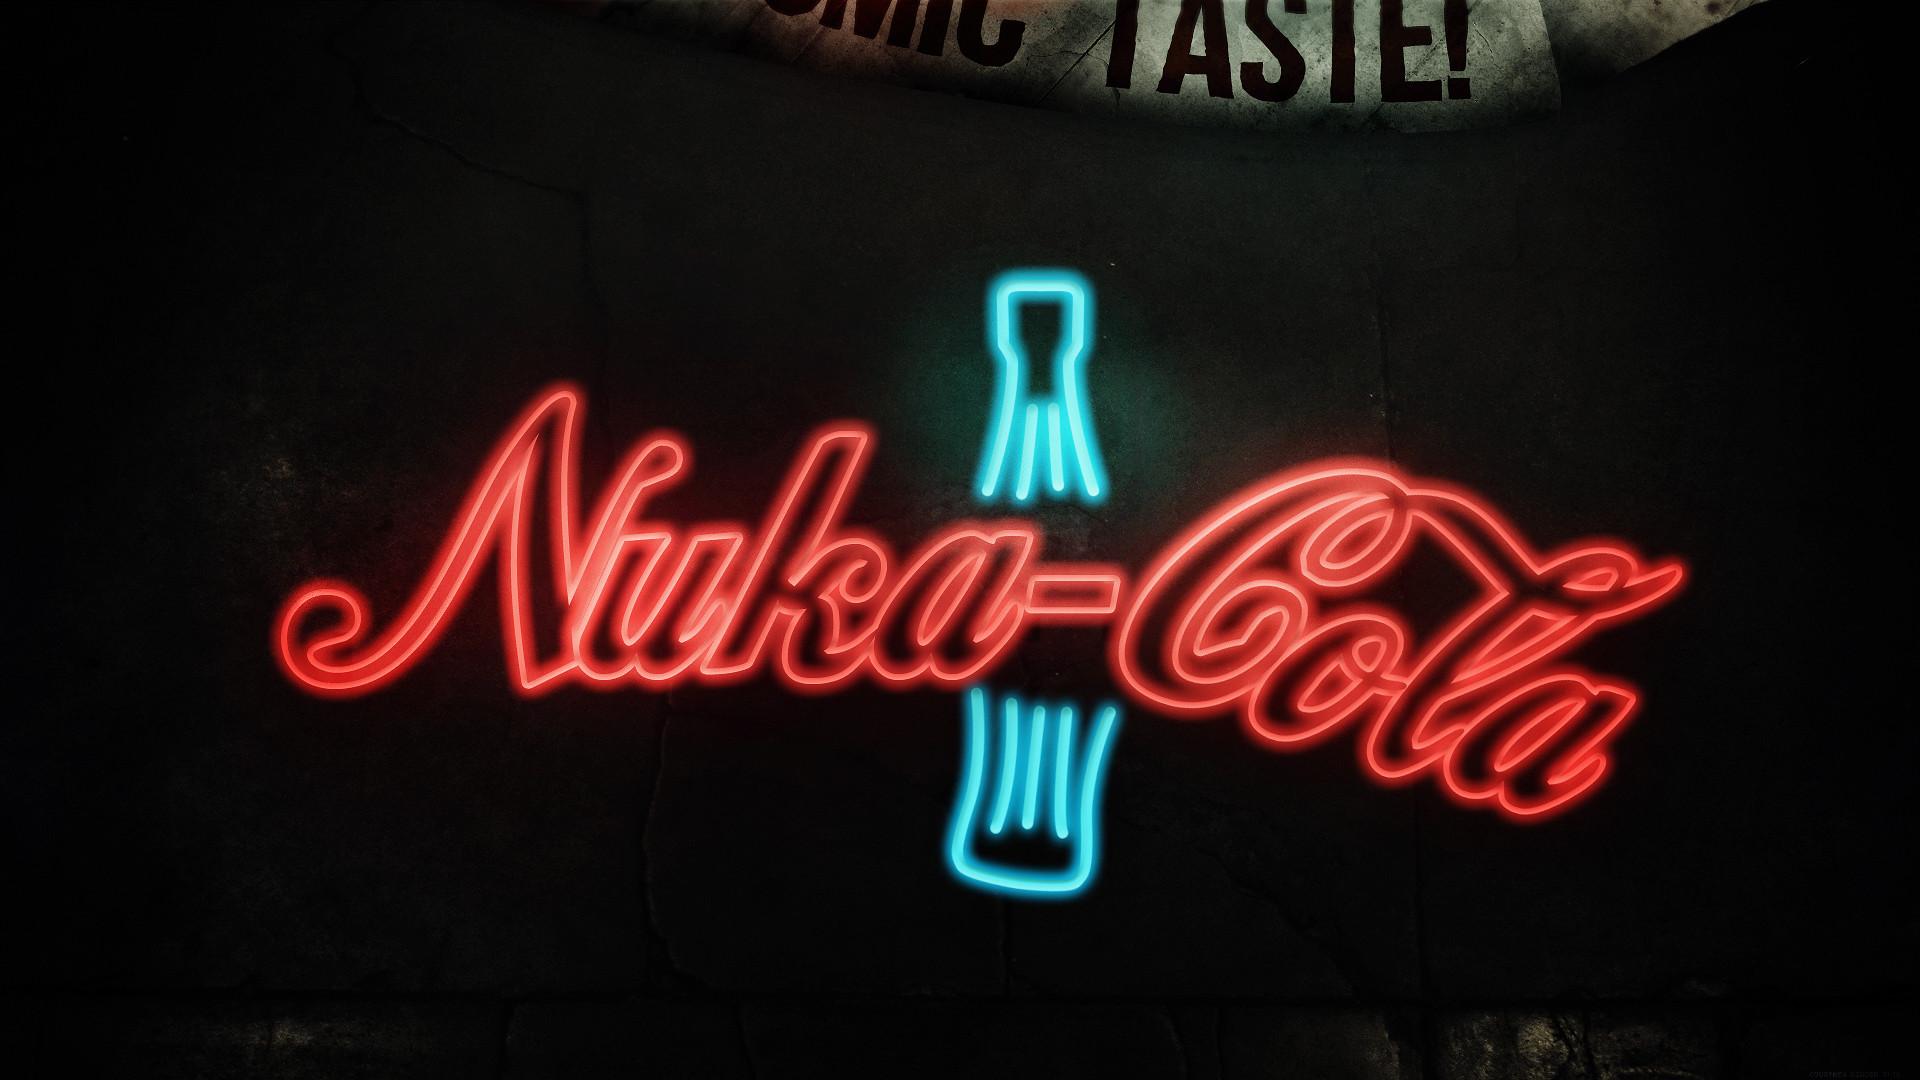 Res: 1920x1080, Nuka-Cola Soda Sign Neon Bottle Fallout HD wallpaper thumb